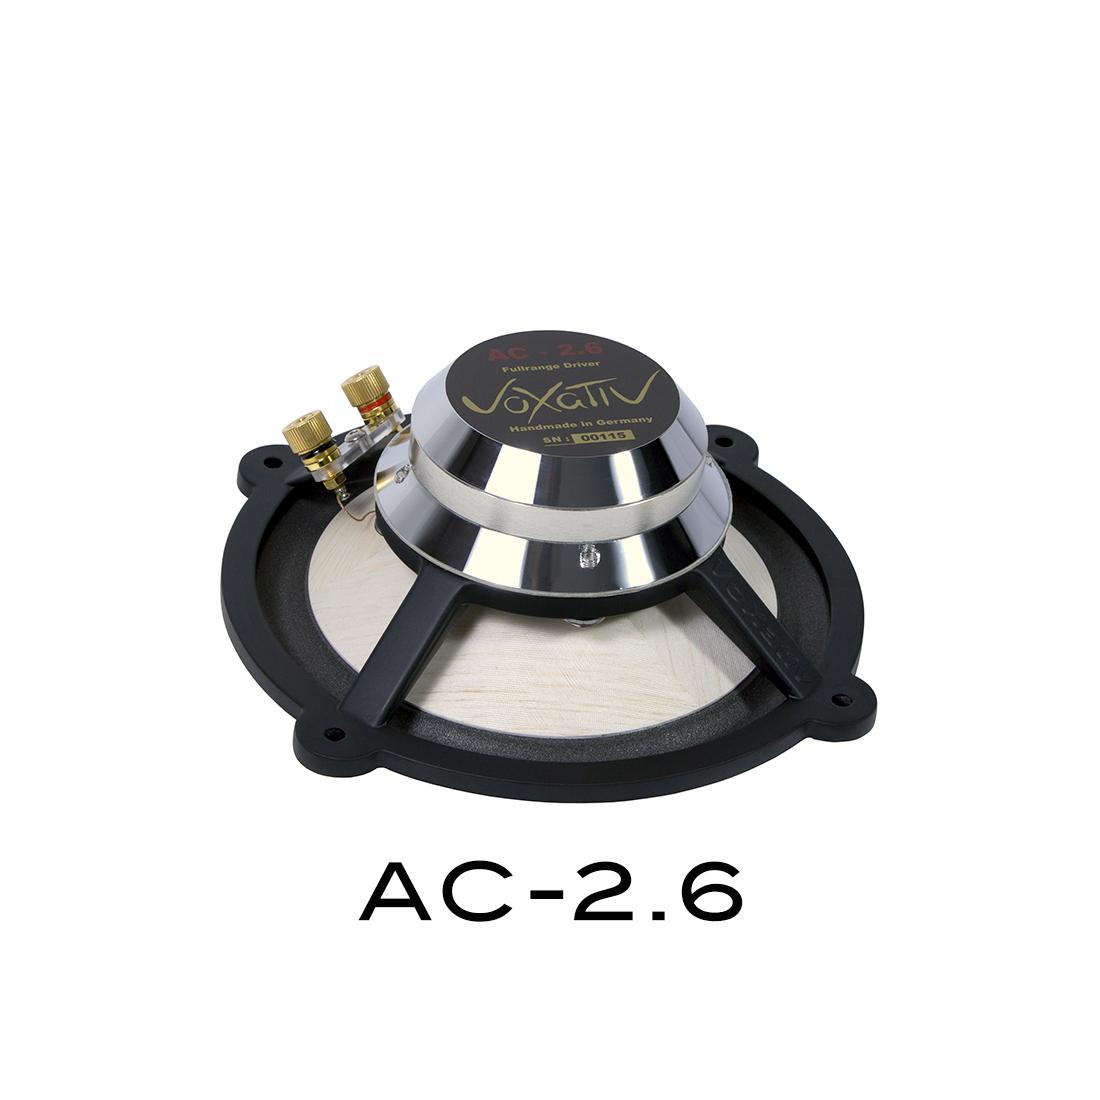 AC-2.6